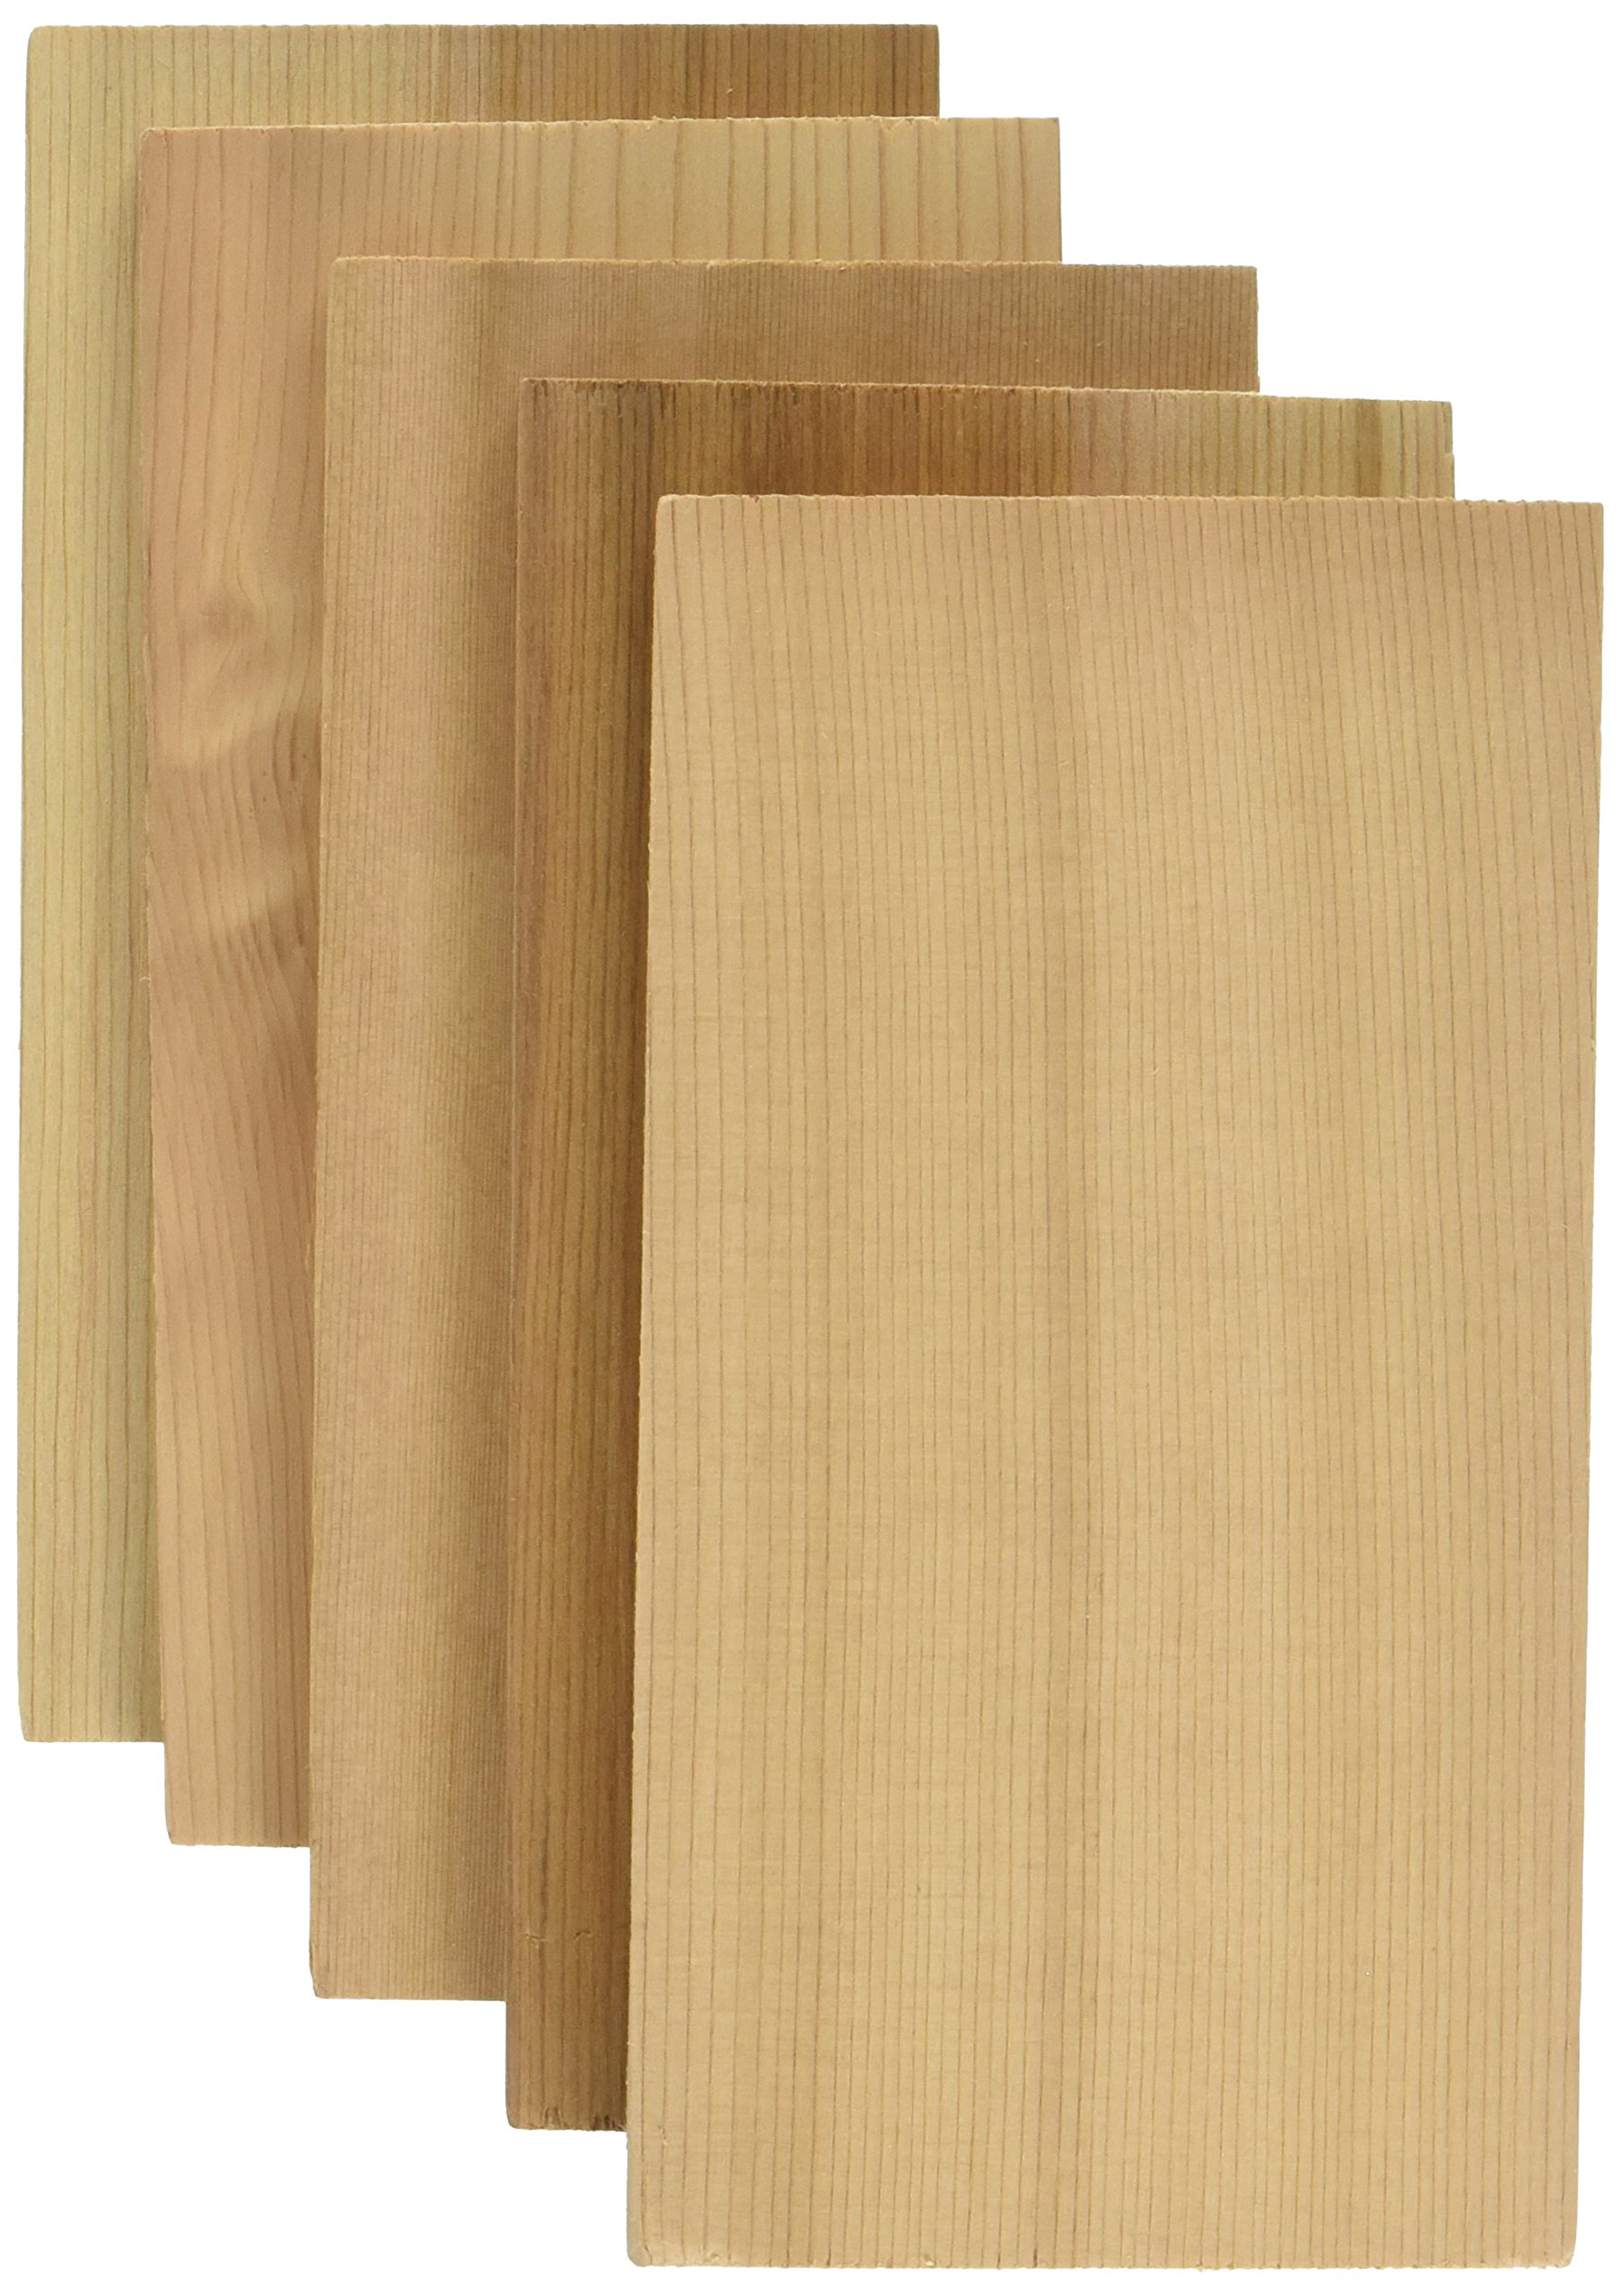 Jaccard Premium Cedar Grilling Planks (5 Pack), Small, Brown Cedar Wood